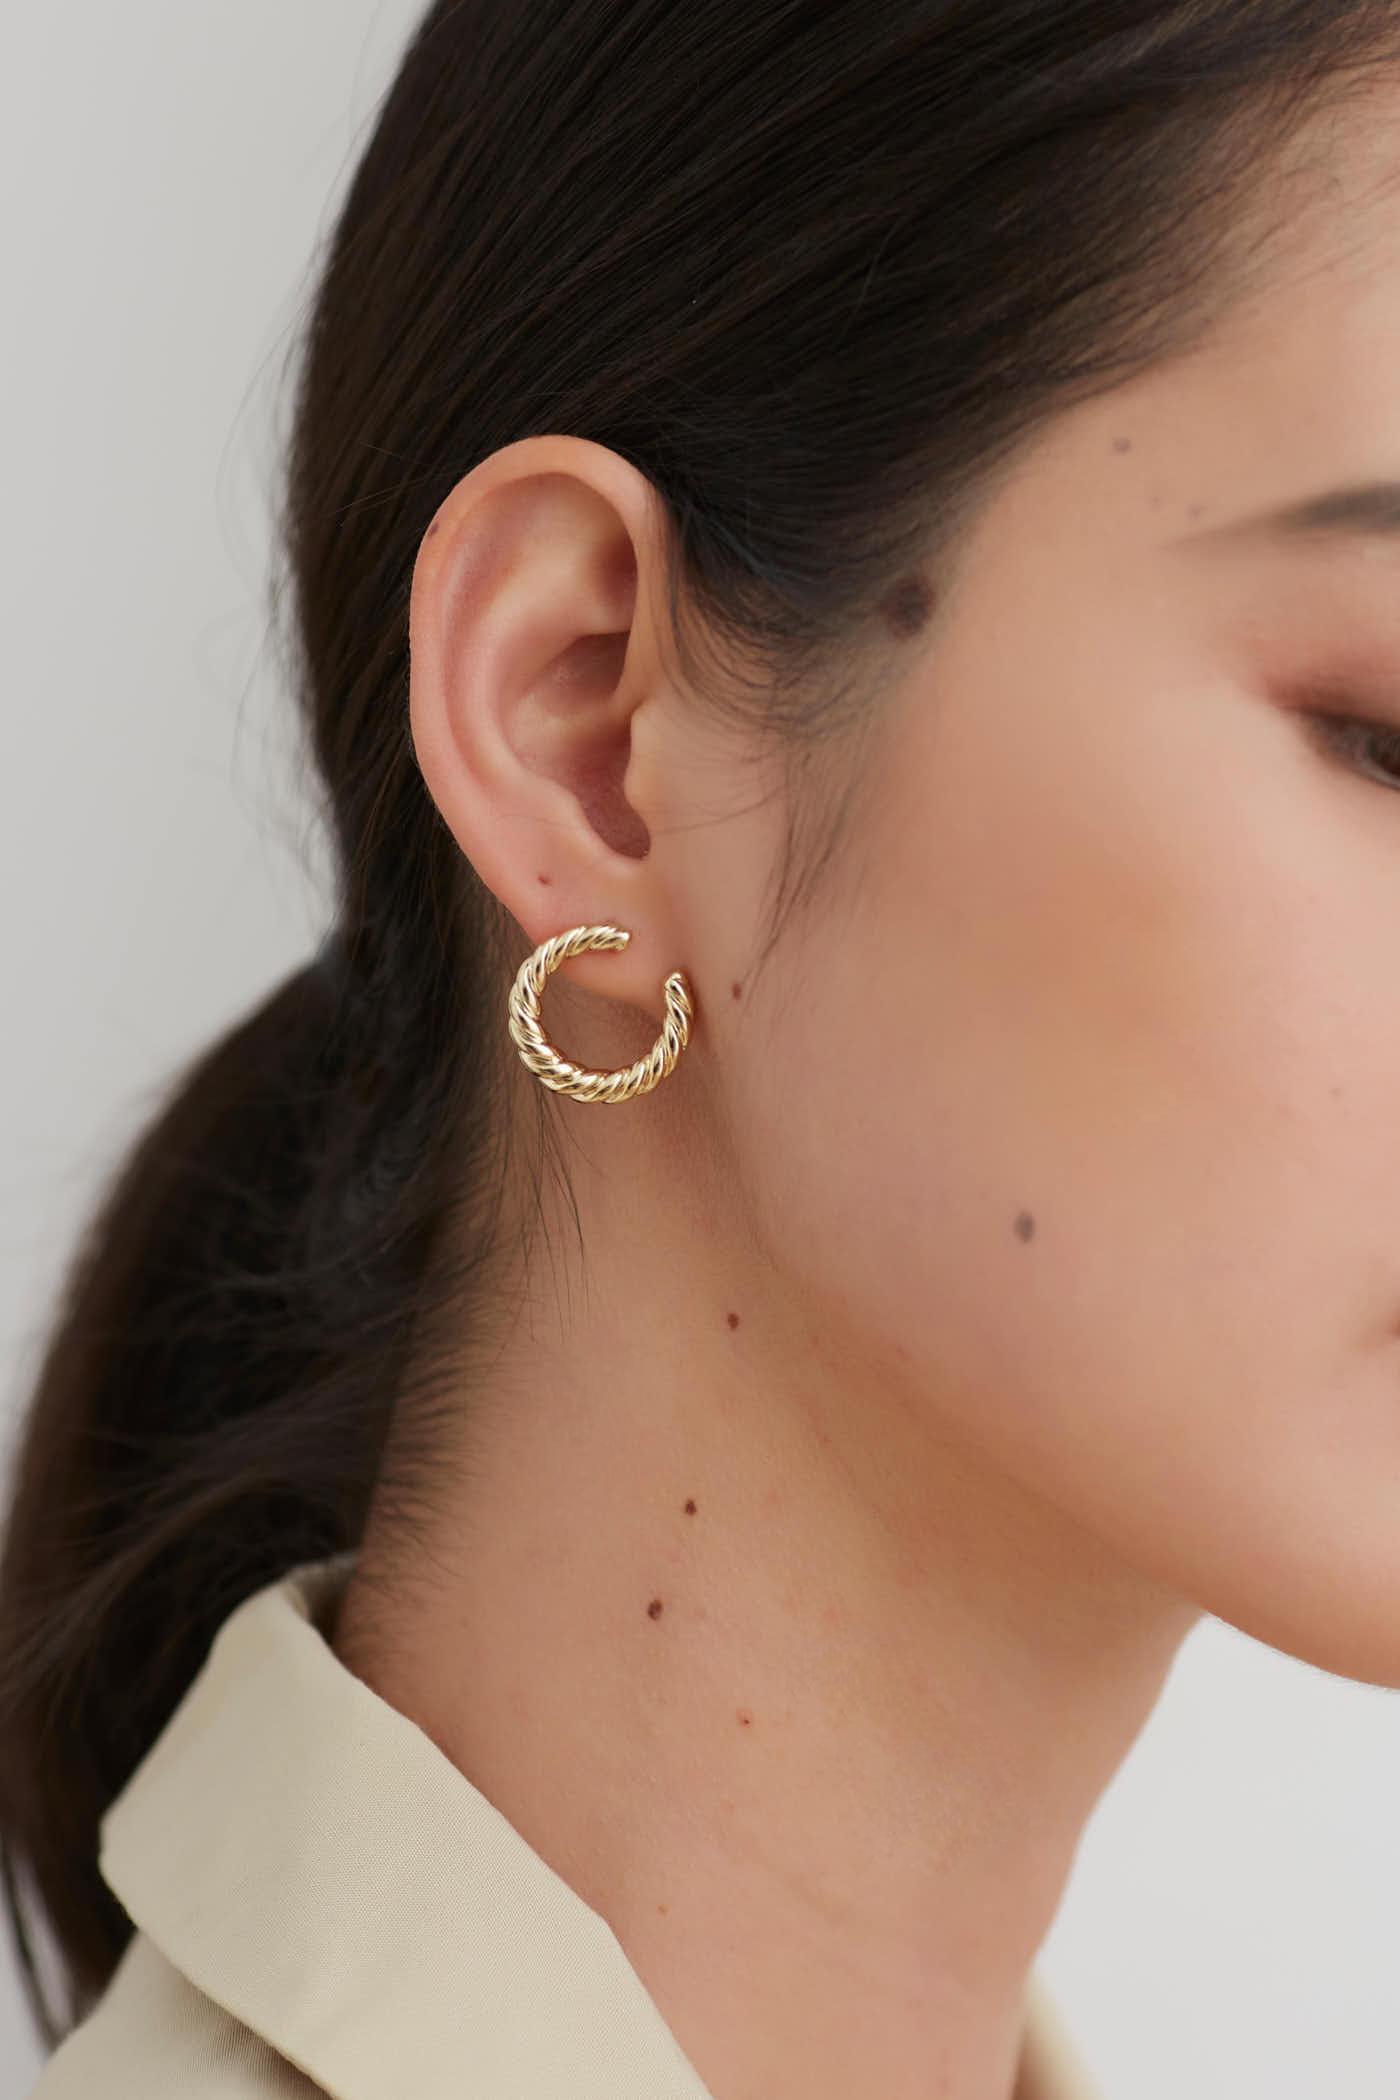 Adda Earrings